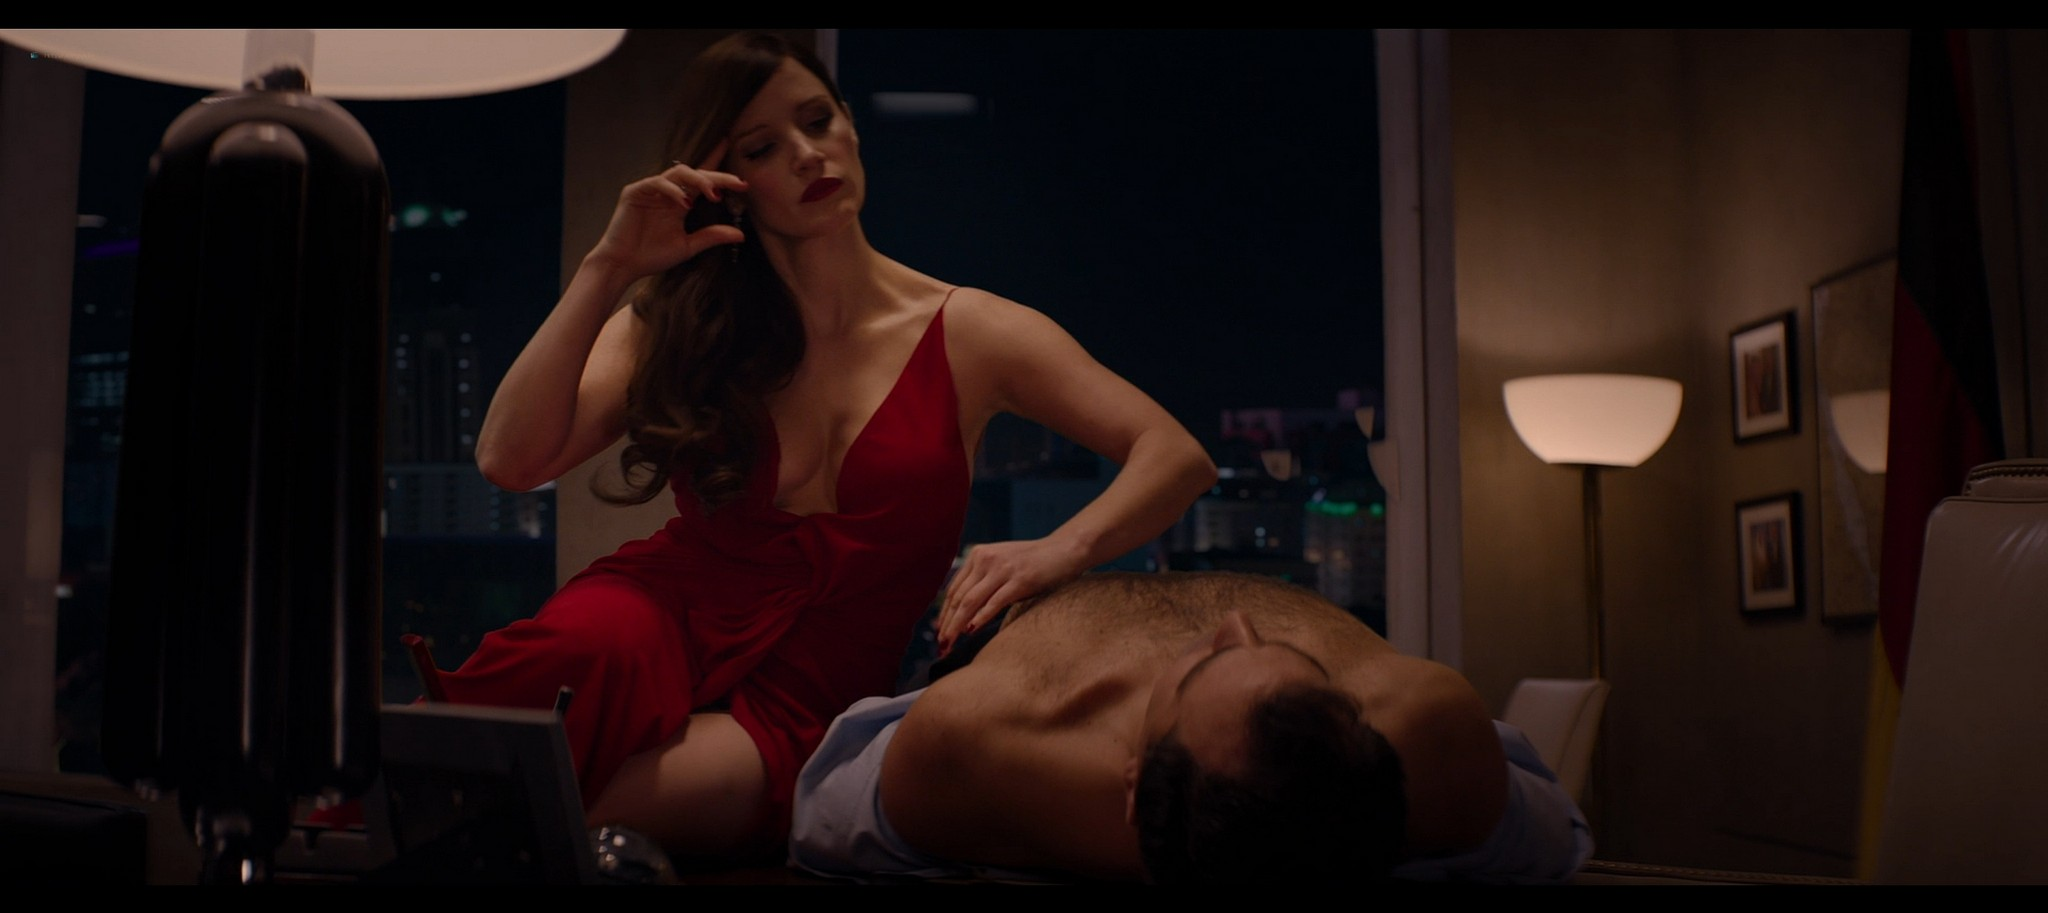 Jessica Chastain hot Jess Weixler sexy Ava 2020 HD 1080p BluRay REMUX 009